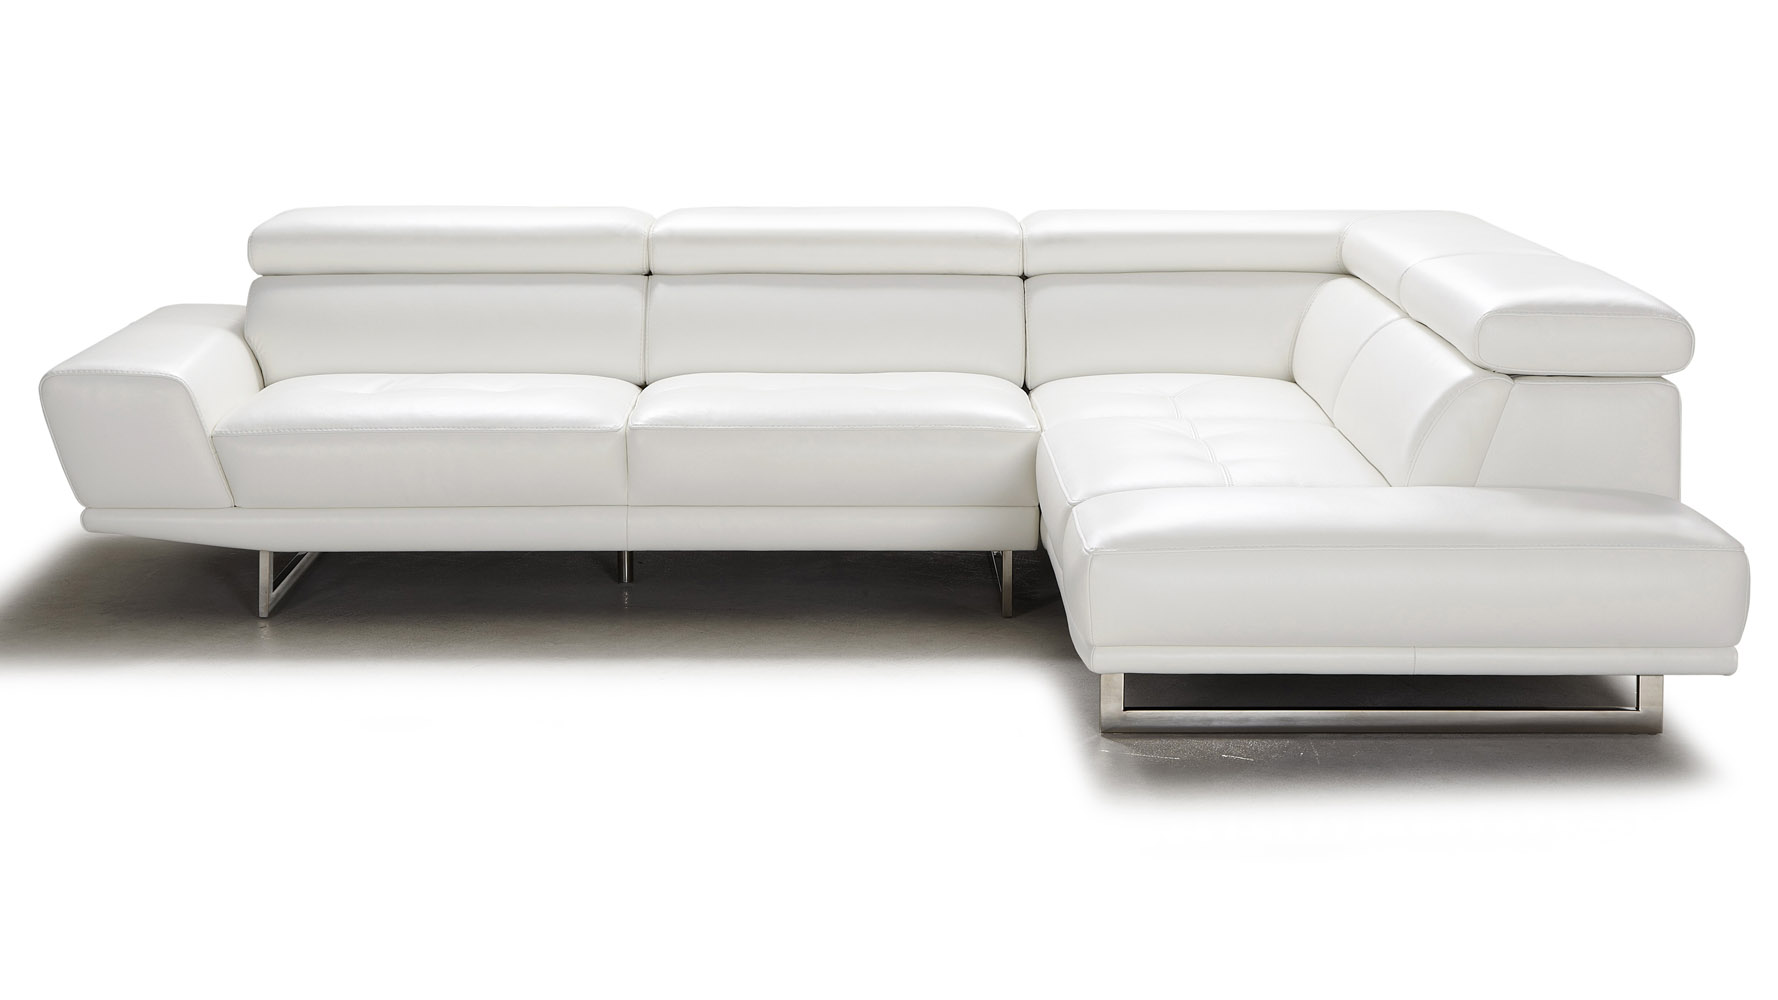 Posh White Top Grain Leather Modern Corner Sectional Sofa With